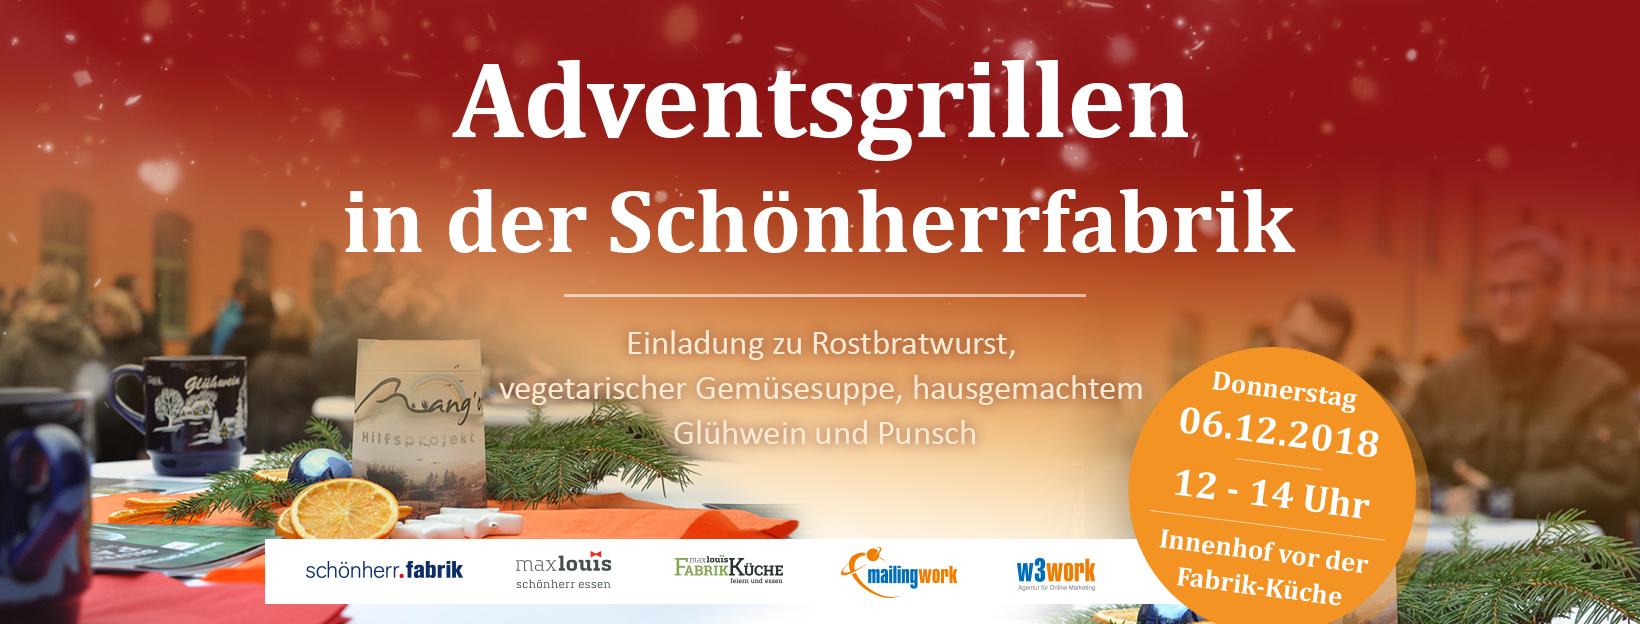 facebook_adventsgrillen2018_2